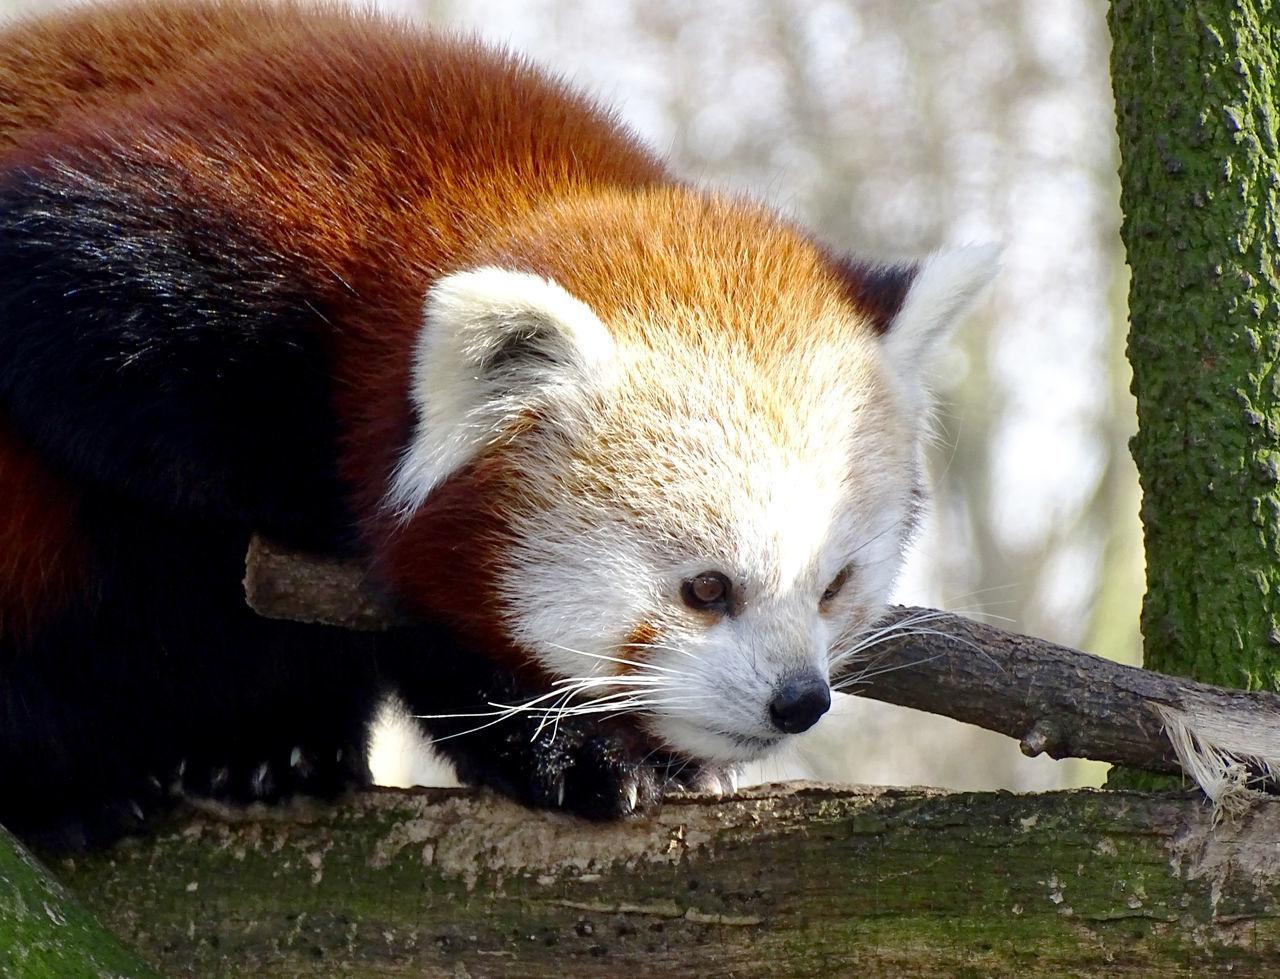 Red Panda Animal Themes One Animal Mammal Nature Amimal Animal Photography Zoo Animals  Animal_collection Animal Head  Animal Portrait EyeEm Gallery EyeEm Best Shots